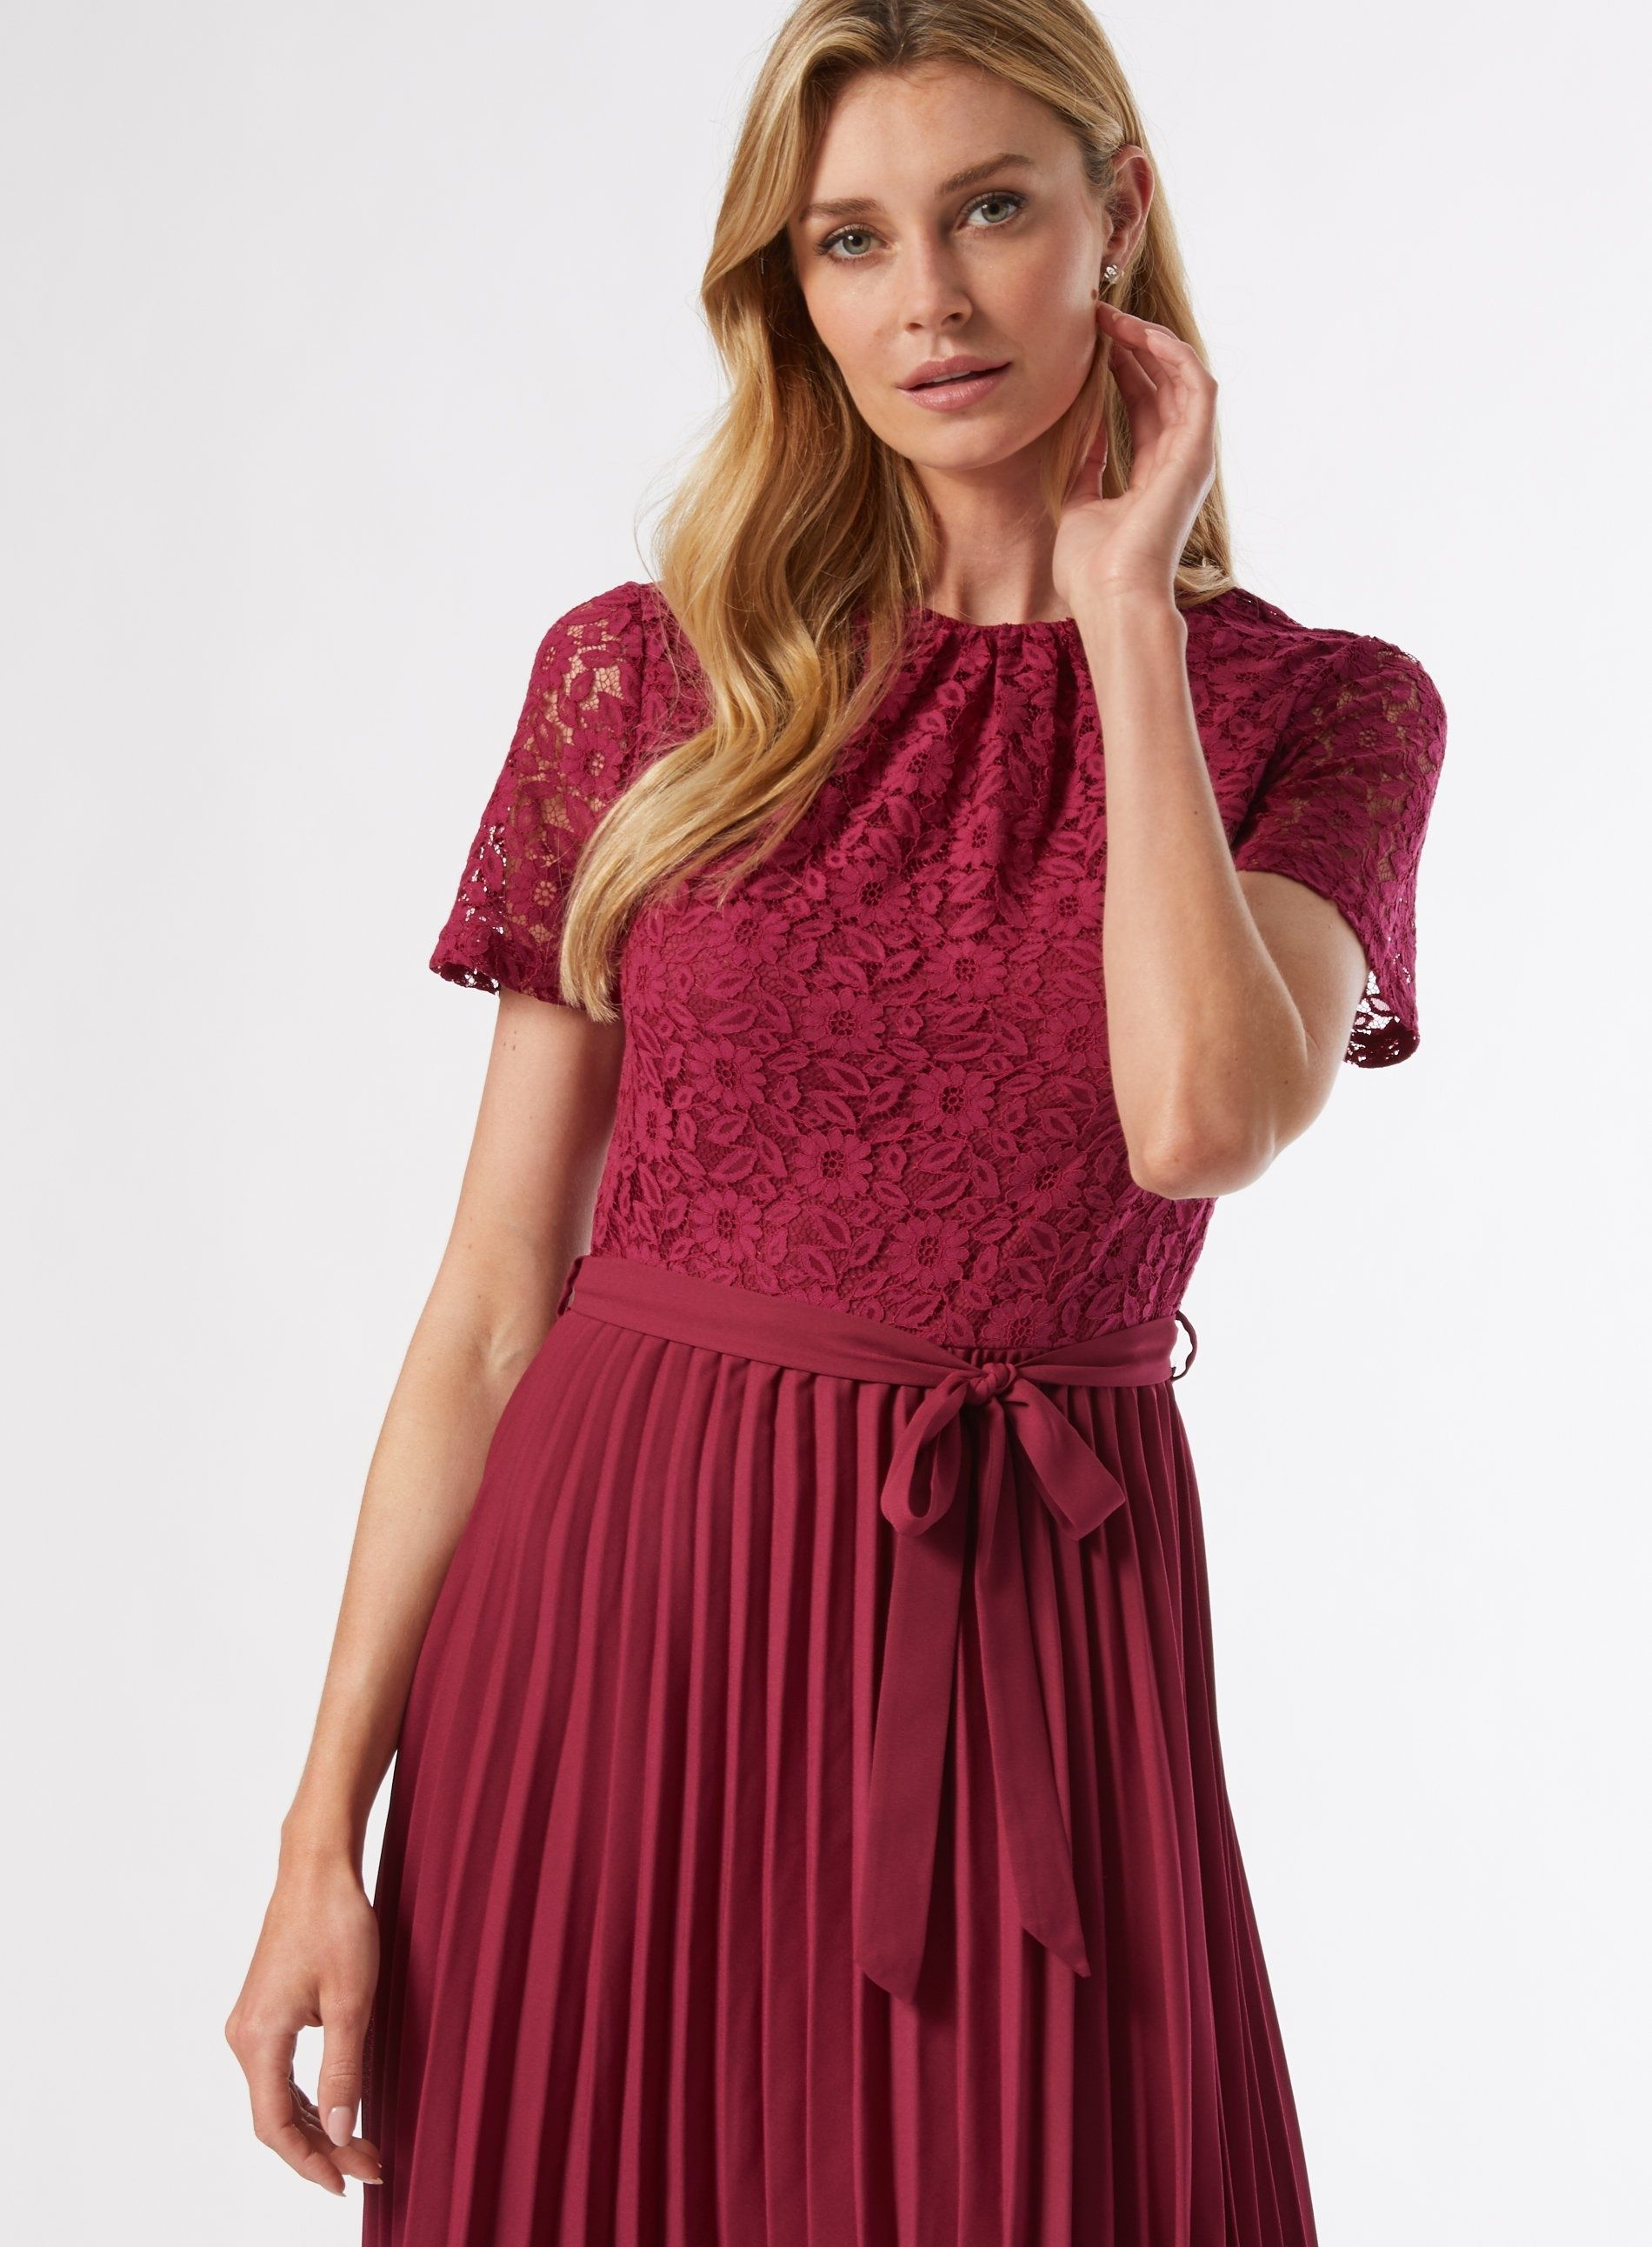 Dorothy Perkins Womens Raspberry Lace Pleat Dress Short Sleeve Round Neck